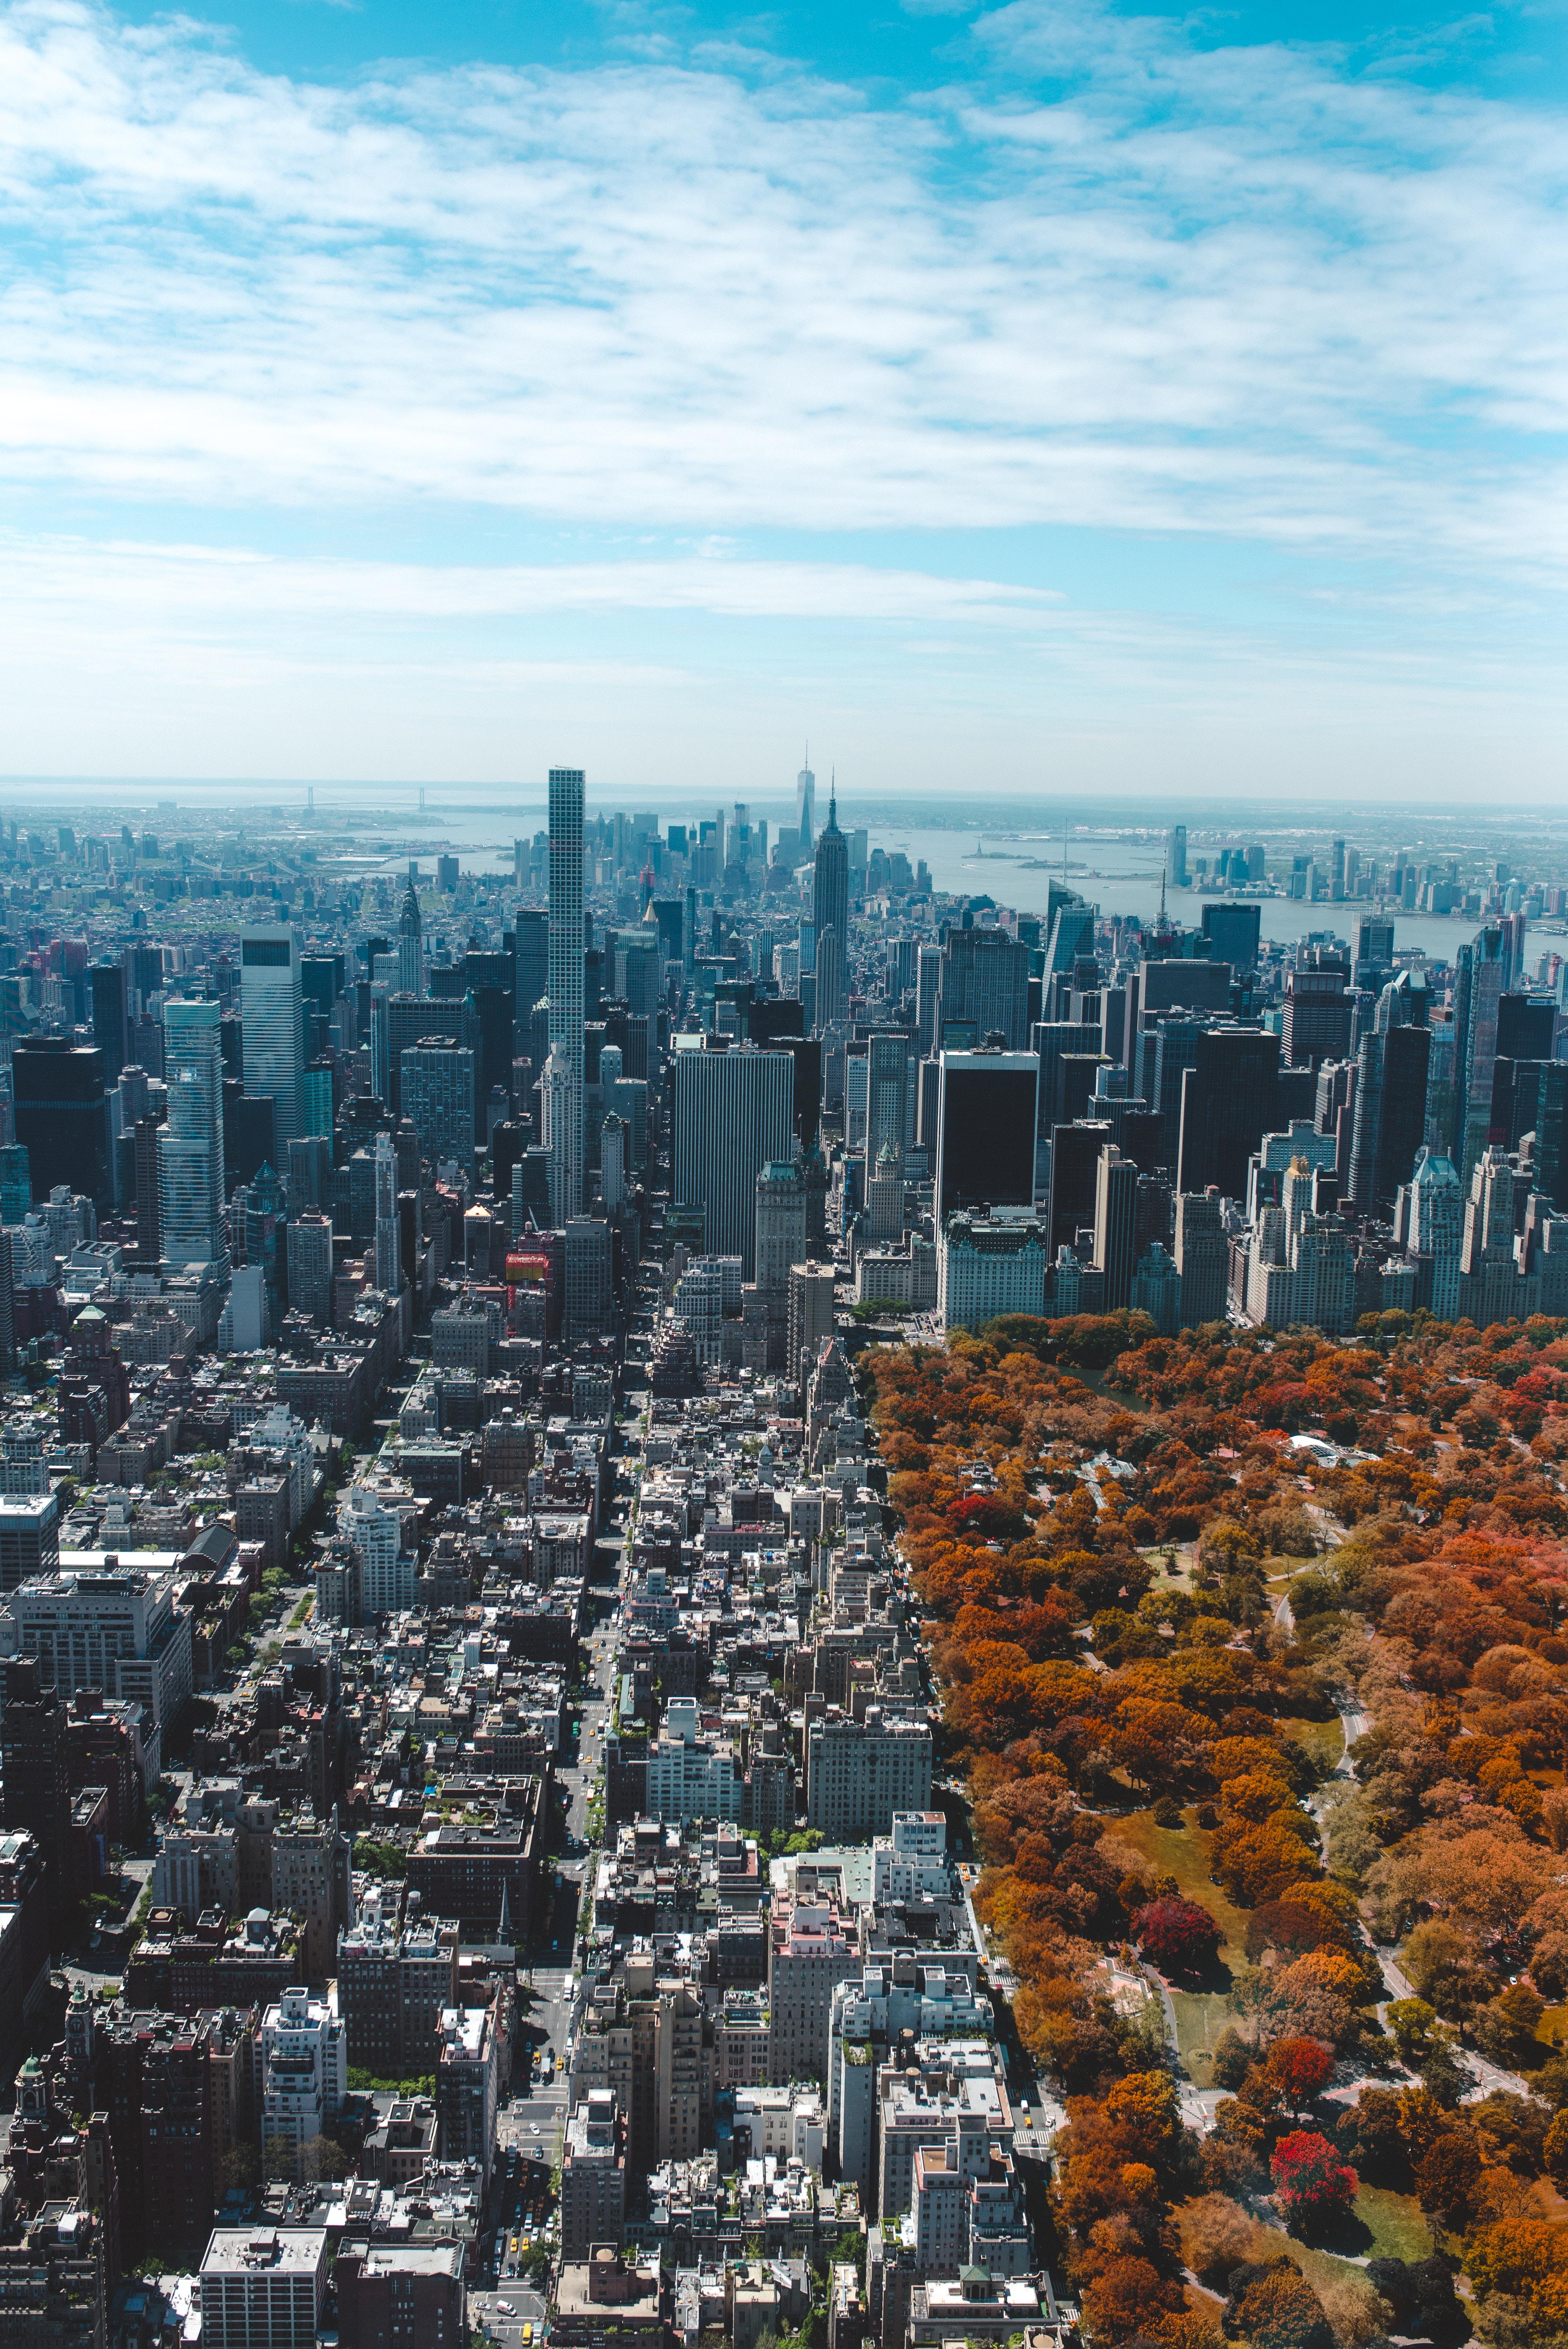 explore NYC via an urban adventure quest